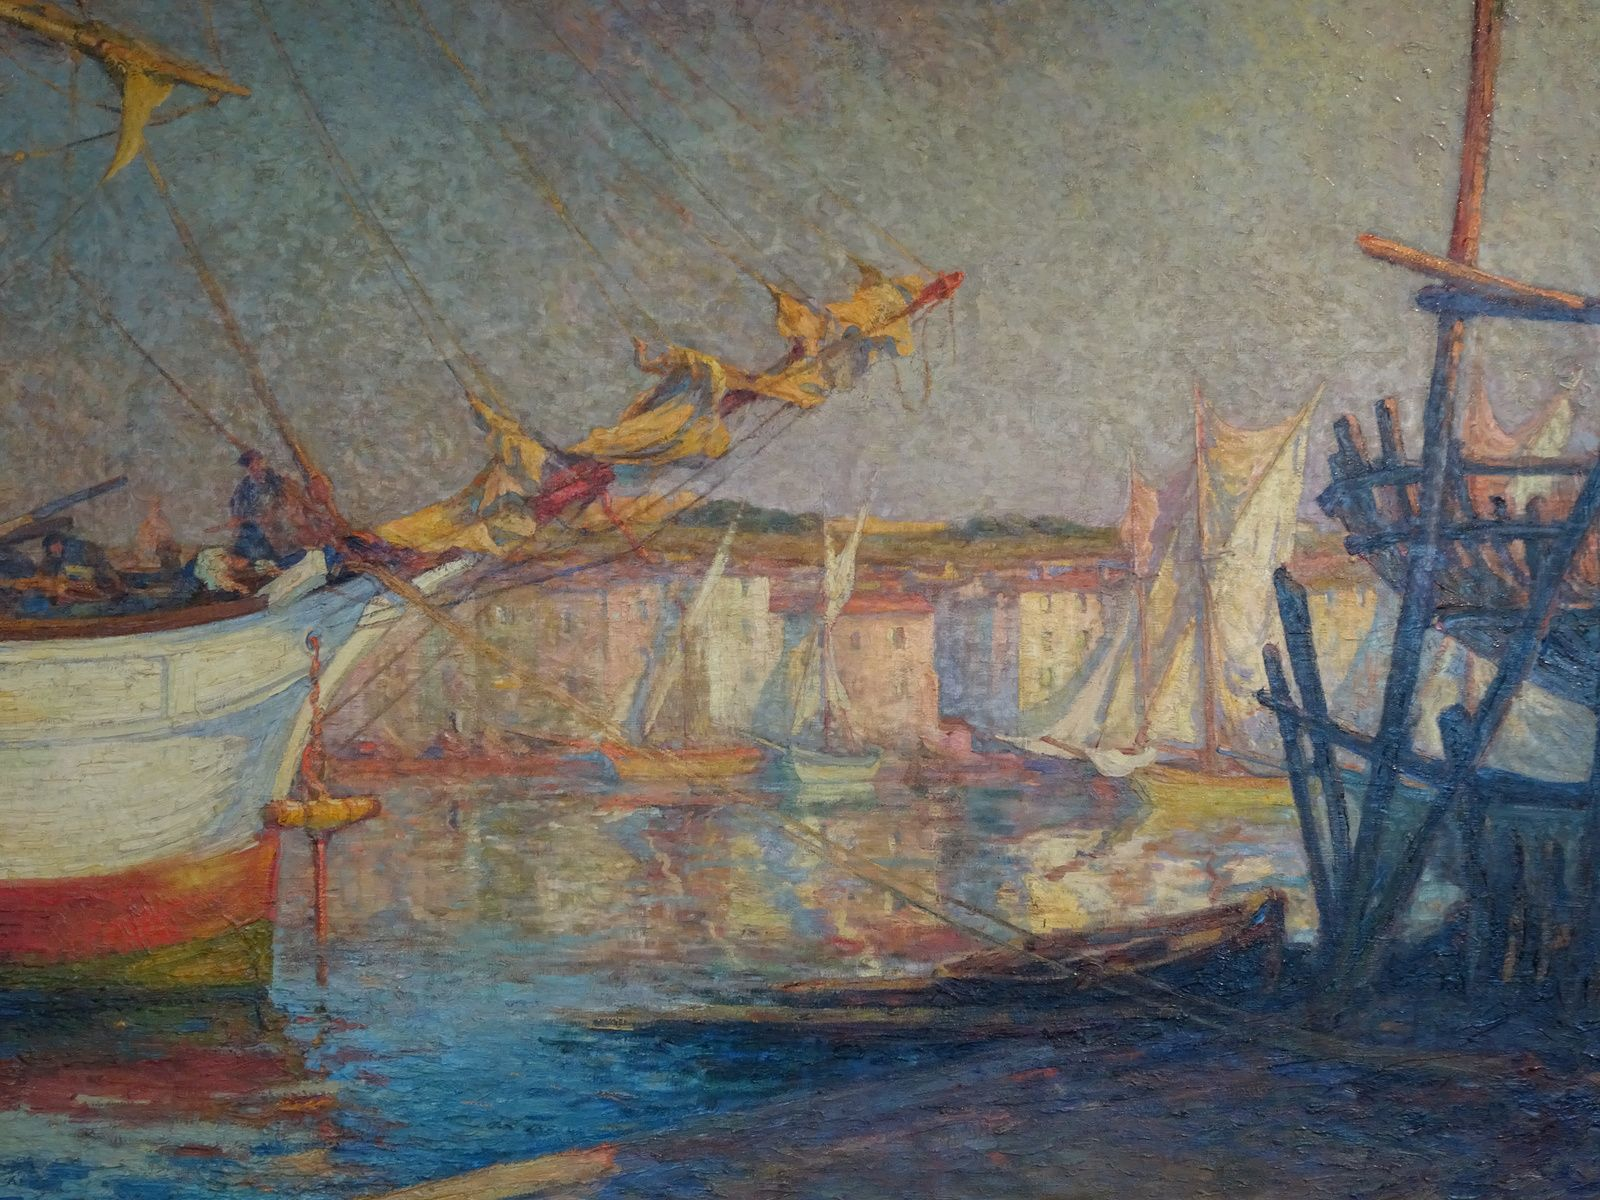 Le musée Regards de Provence de Marseille